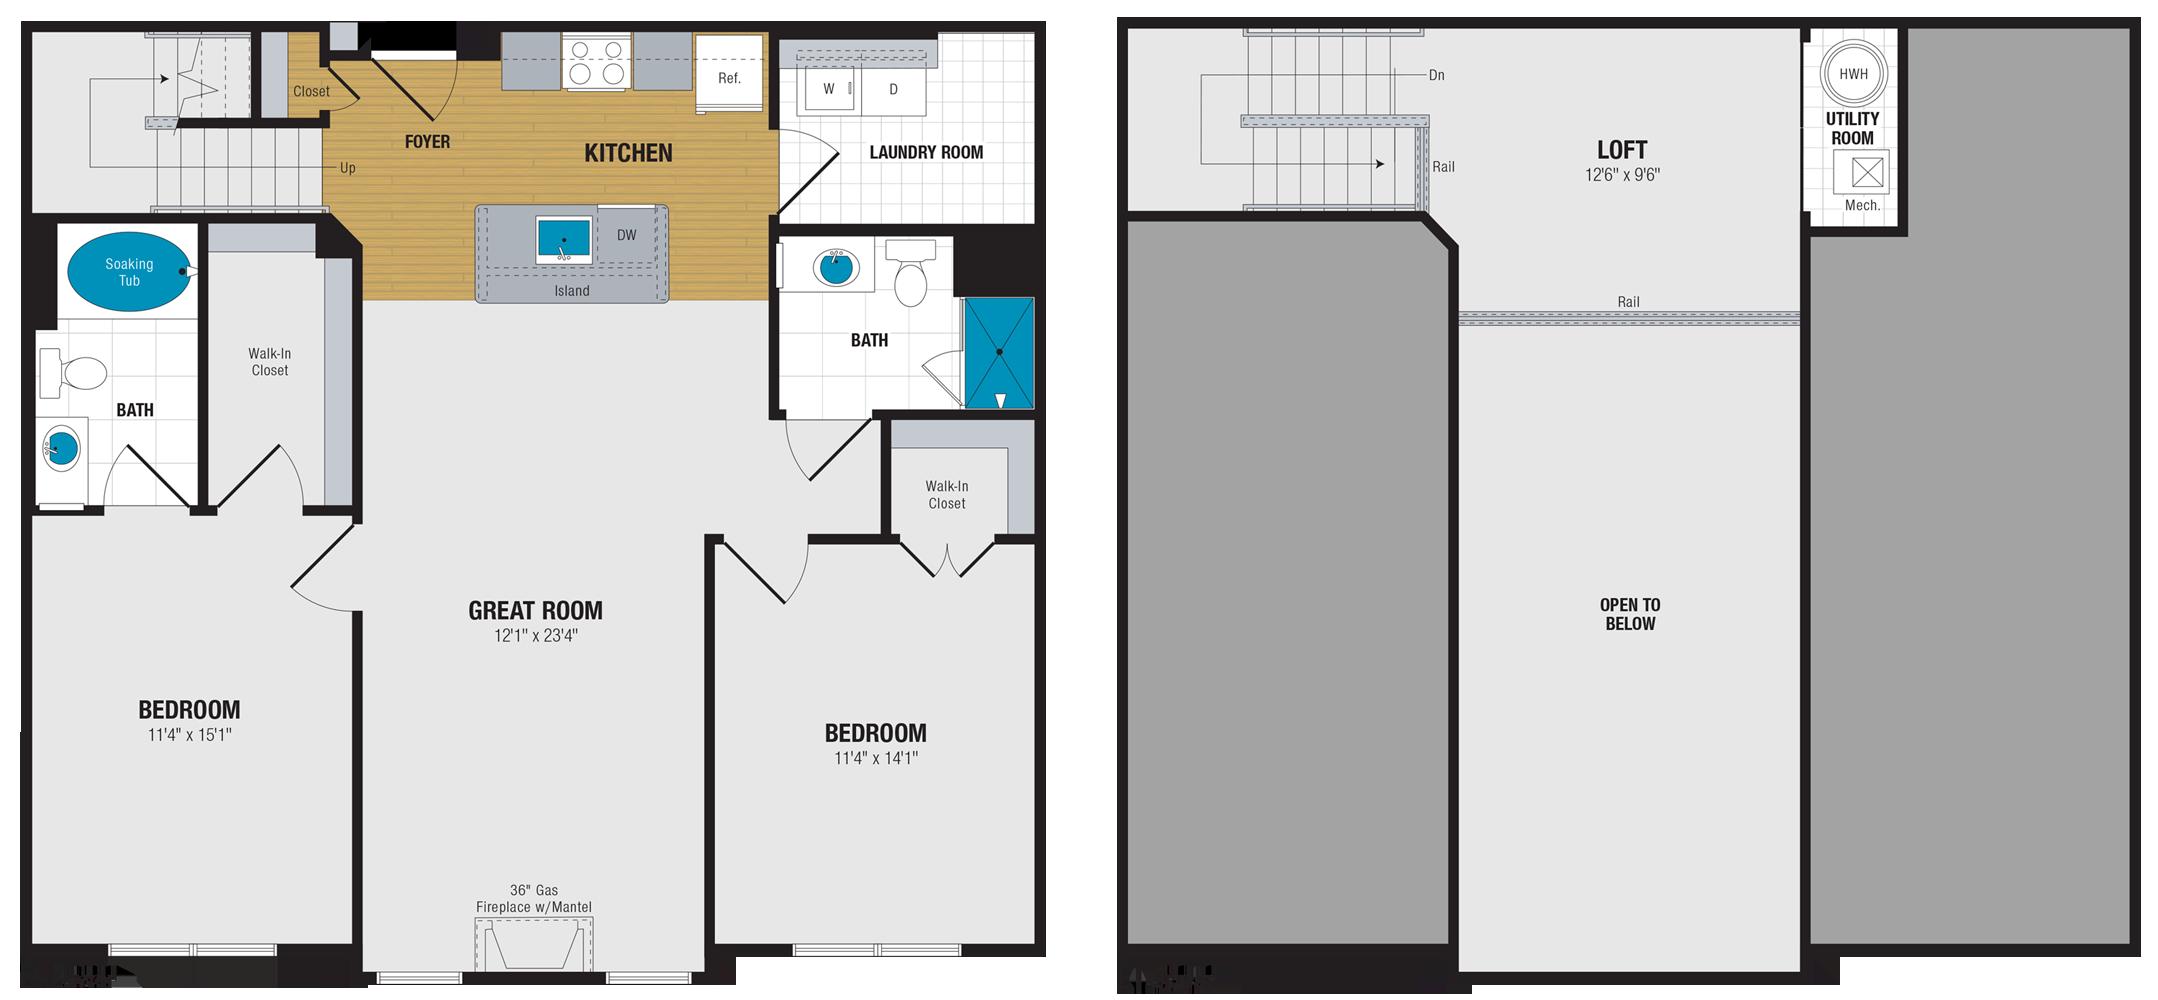 Md abingdon theenclaveatboxhill p0663789 34570722196465 2 floorplan(1)